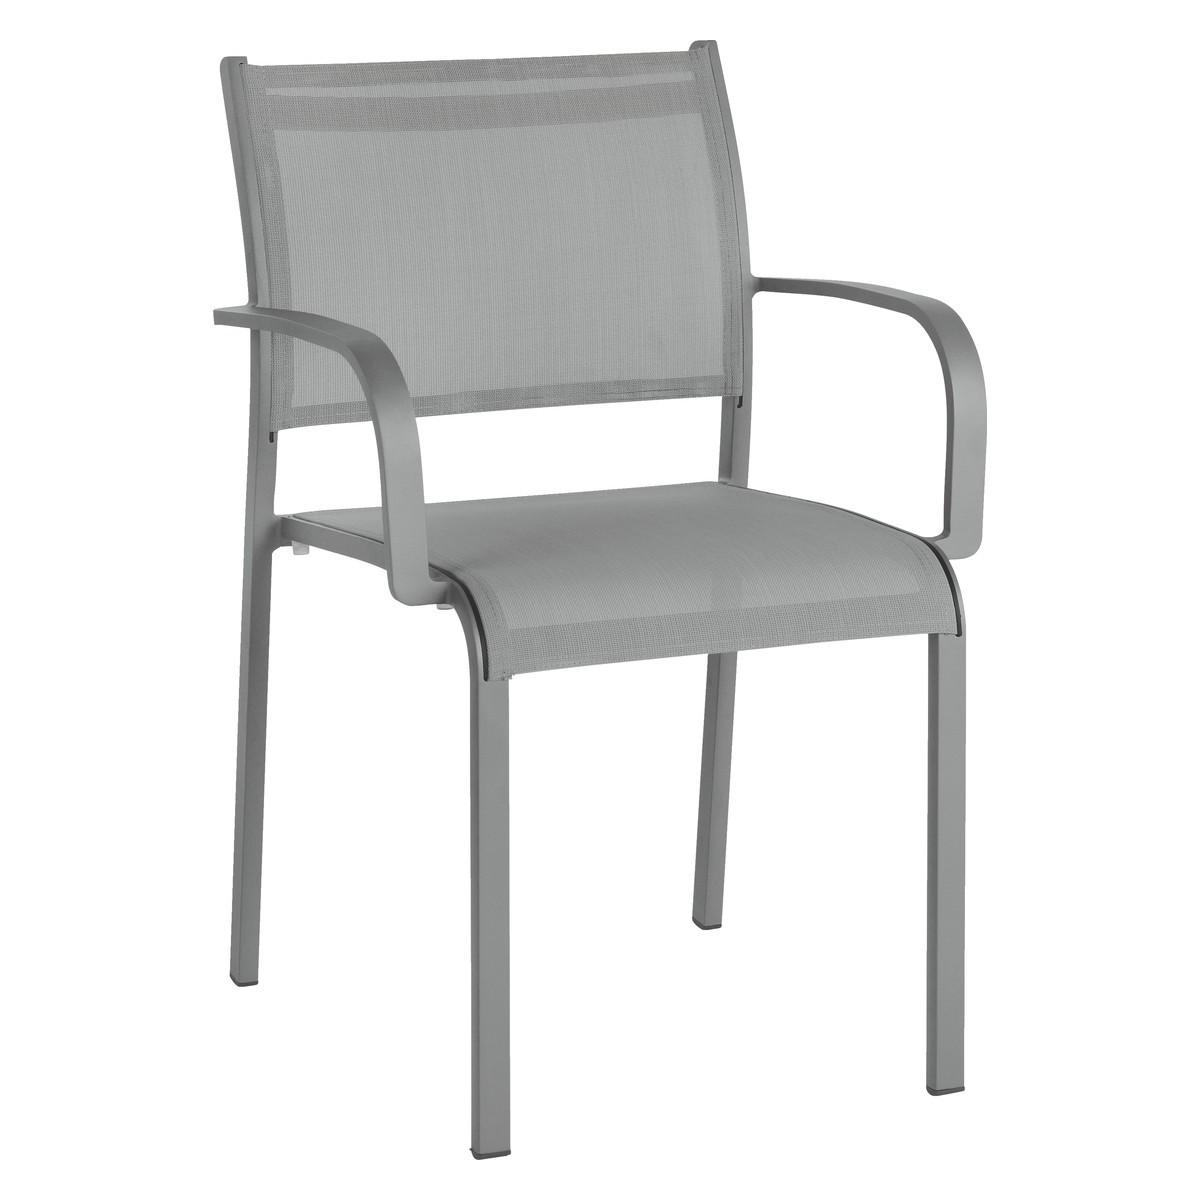 garden chairs willsden grey stackable garden chair promotion. previous next PSCSCWG